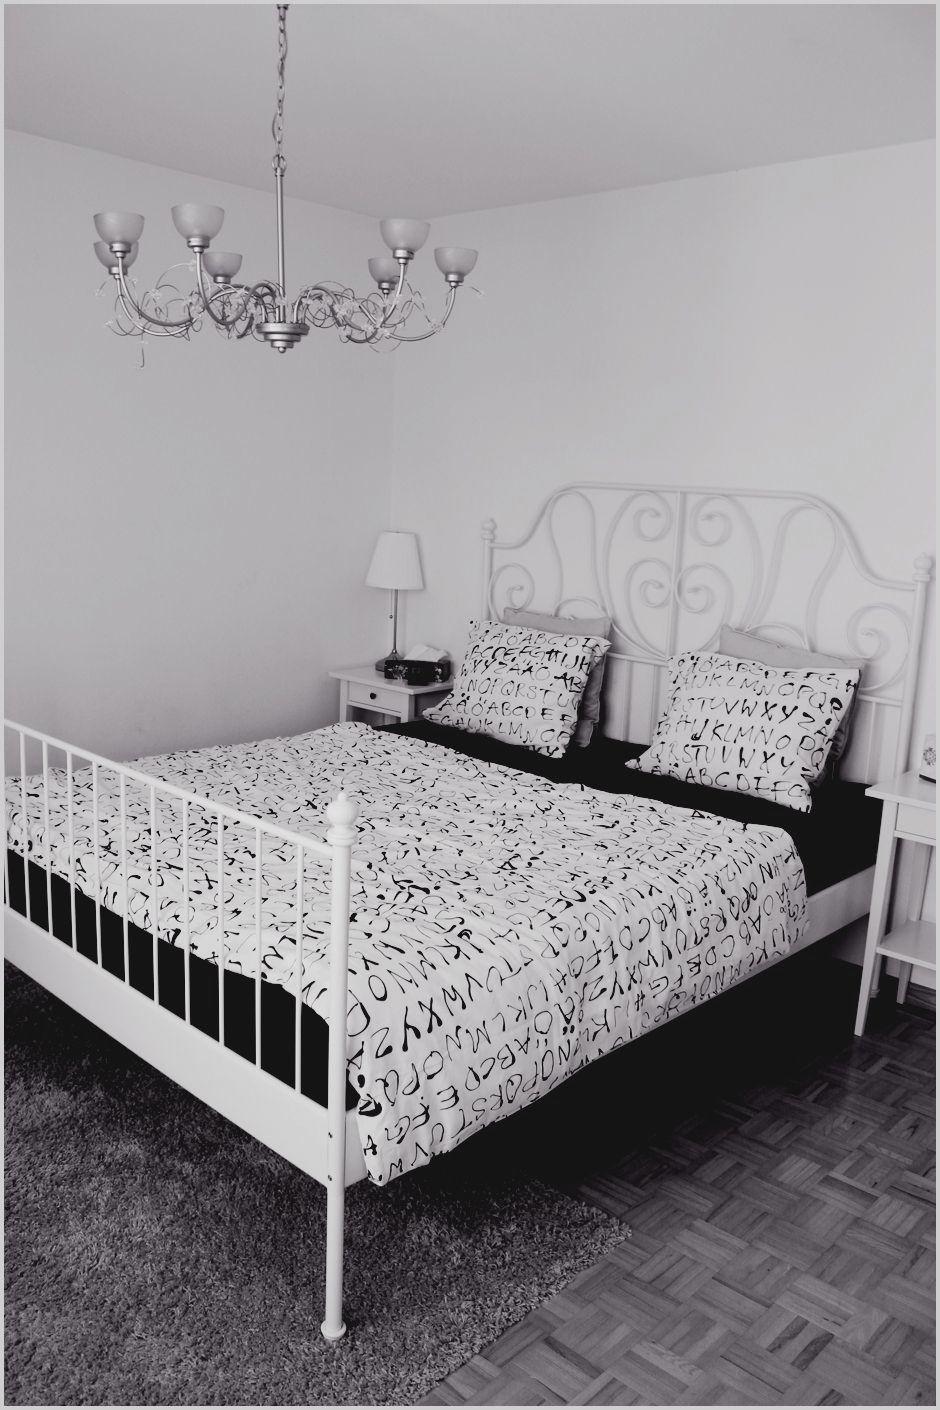 Ikea Black Bedroom Furniture Decor V 2020 G Komnaty Mechty Interery Spalni Dizajn Spalen